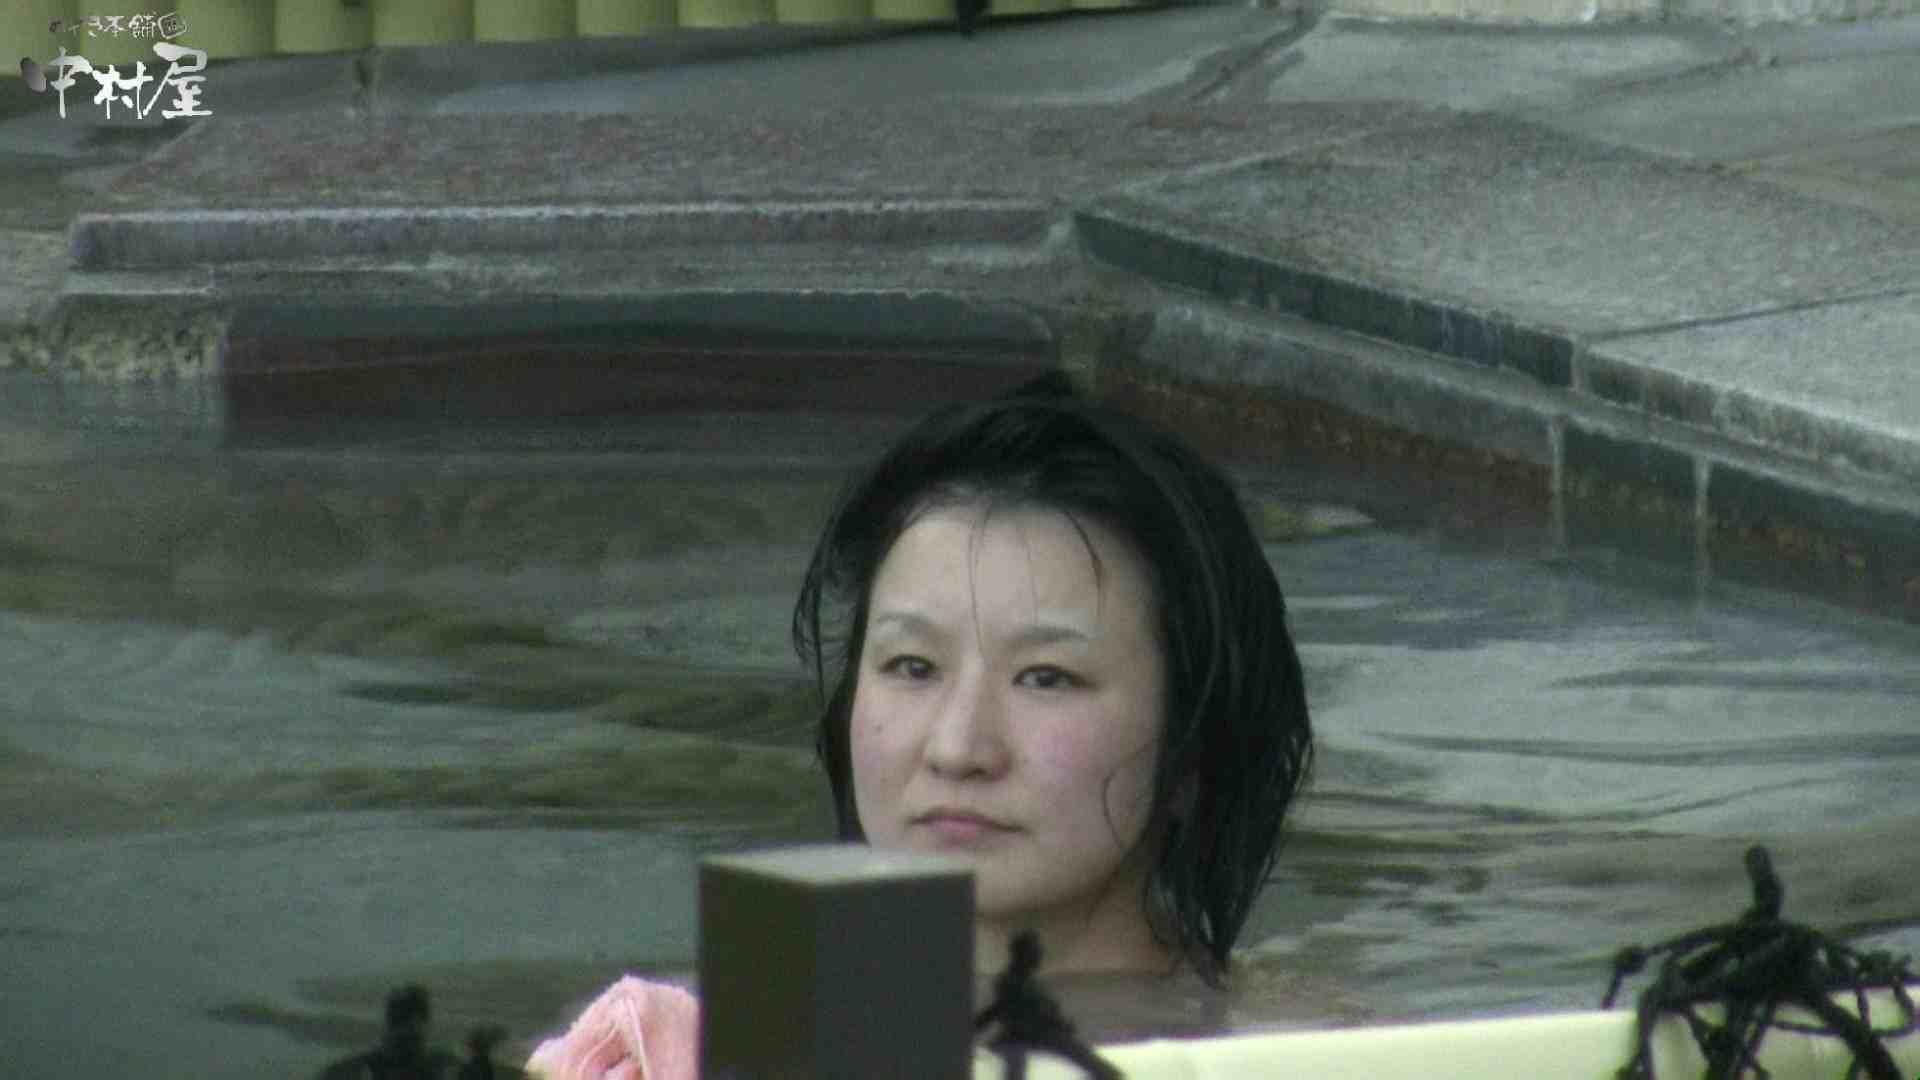 Aquaな露天風呂Vol.982 露天風呂編  78PIX 24